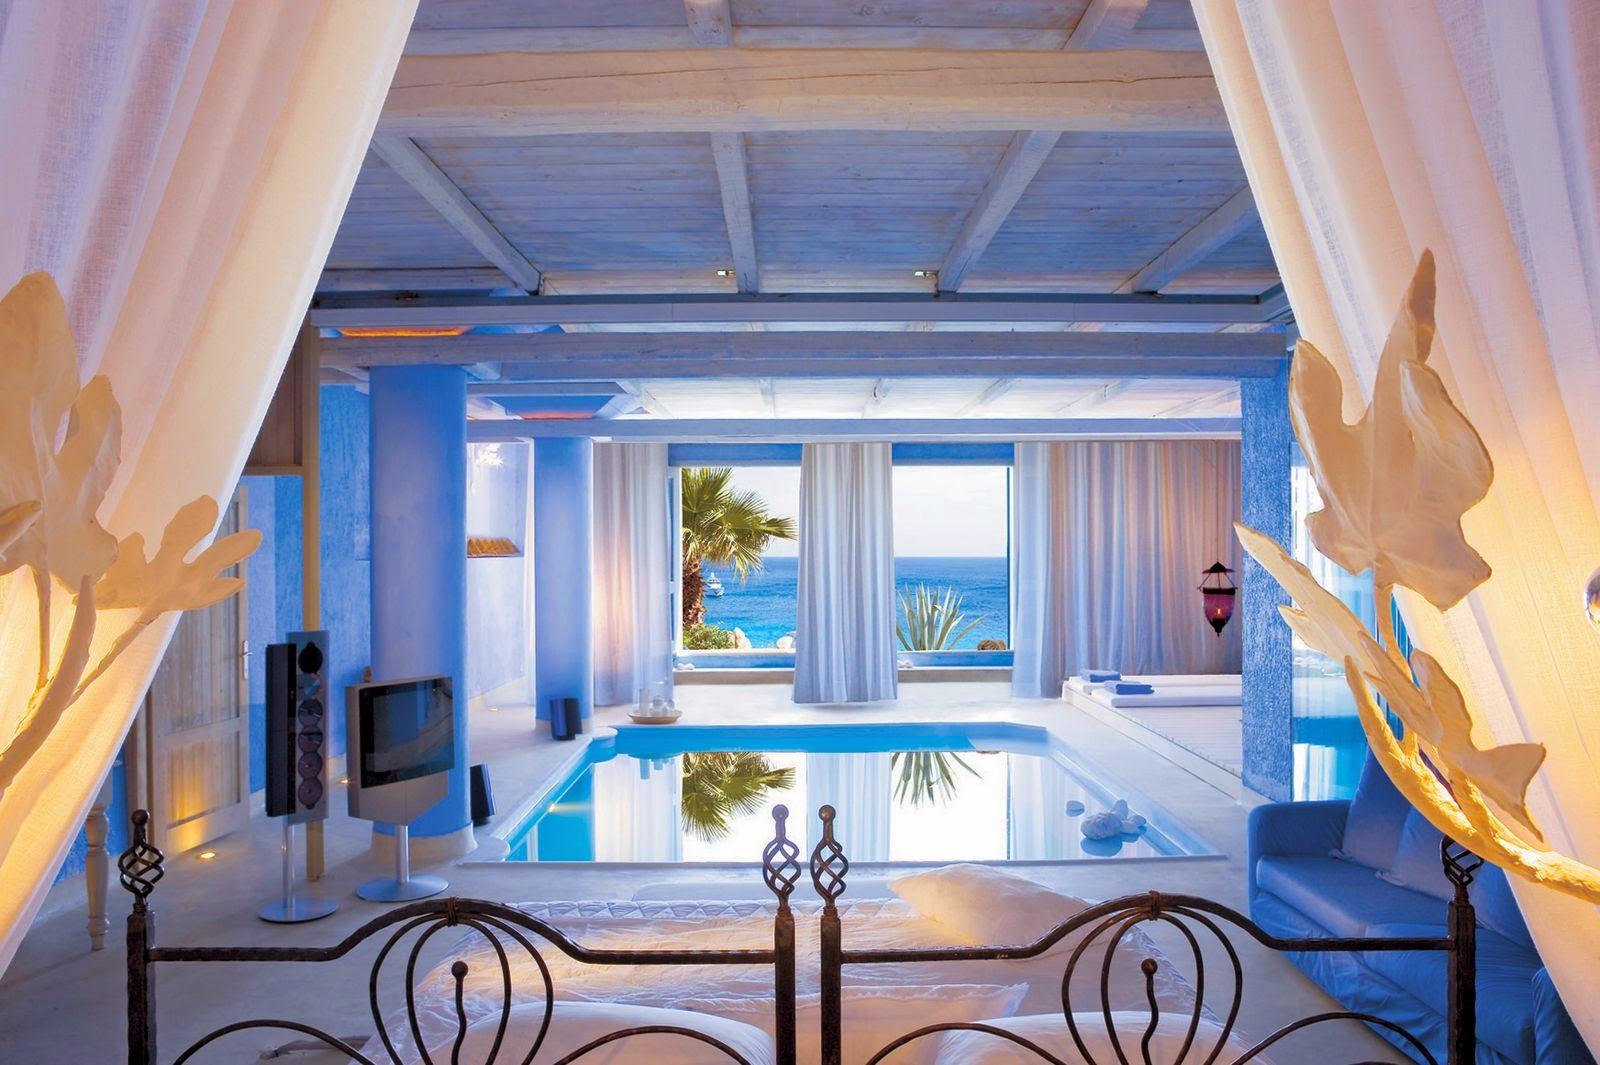 Mykonos (Grecia) - Mykonos Blu Grecotel Exclusive Resort 5* - Hotel da Sogno